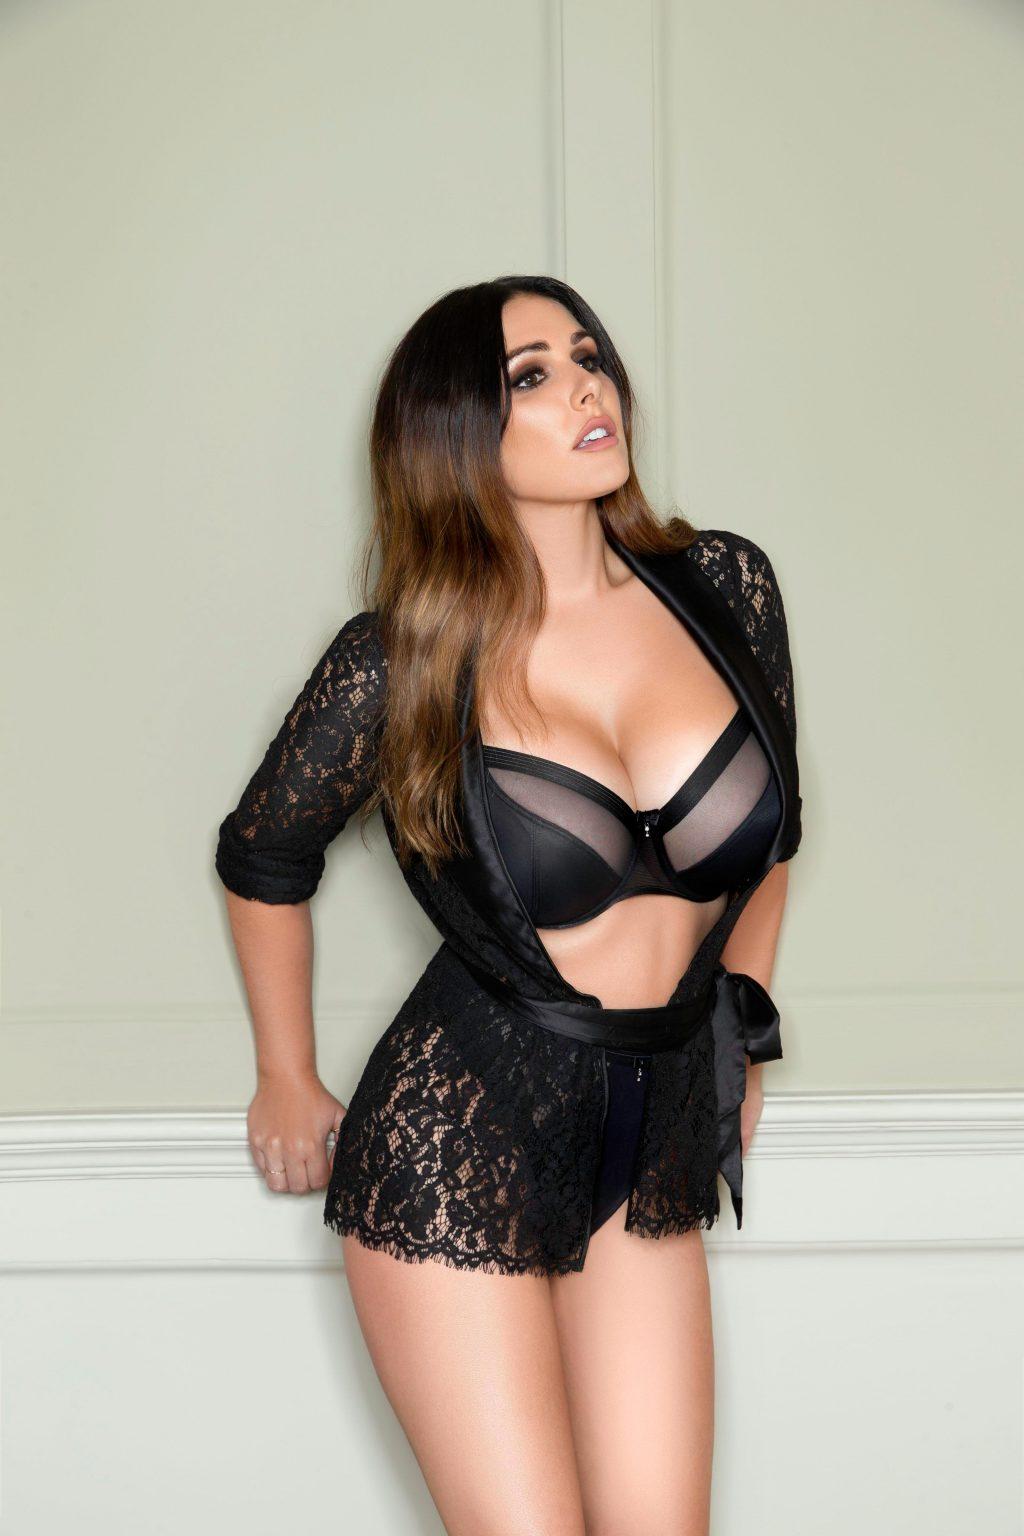 Ass Jordan Capozzi nude (61 foto and video), Ass, Paparazzi, Instagram, bra 2019